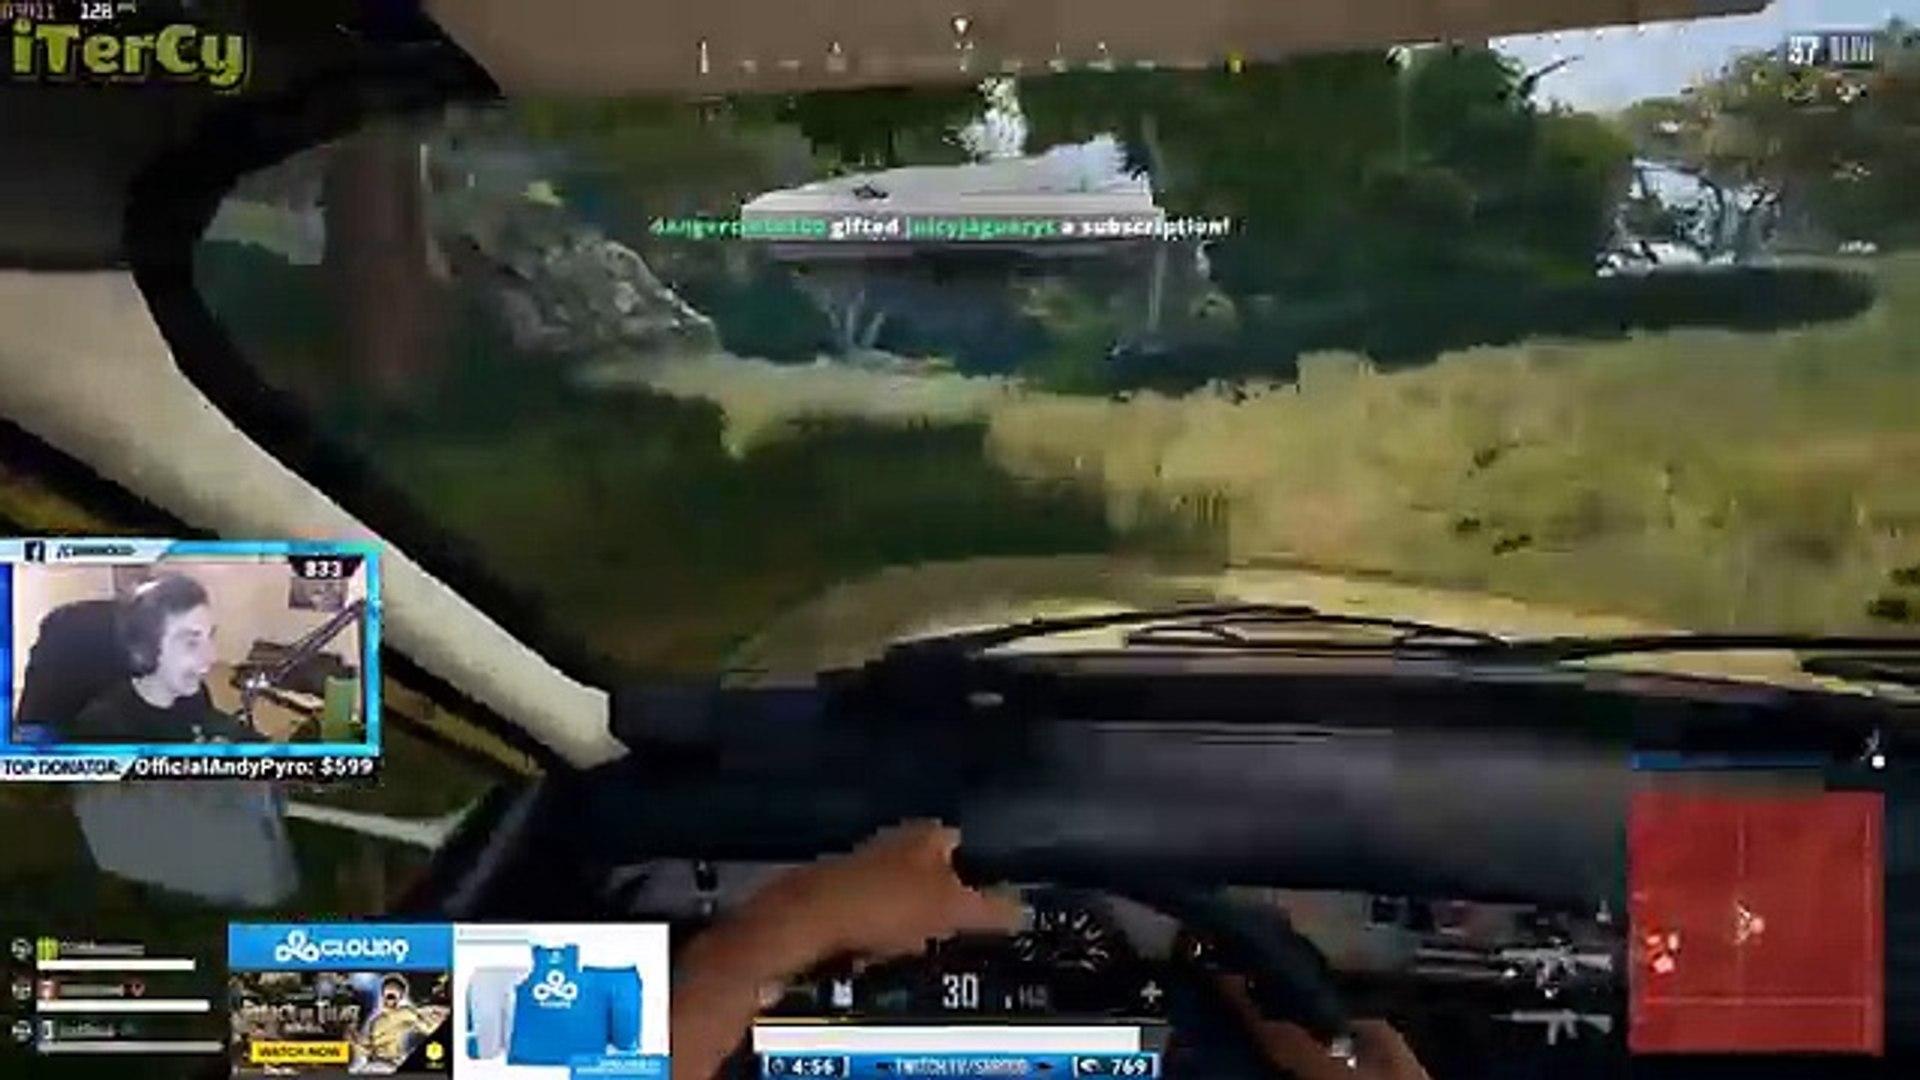 [Tổng hợp PUBG] - Pha ném nade được 5 kills - Khi Shroud bắn Kar98 - Random moments PUBG